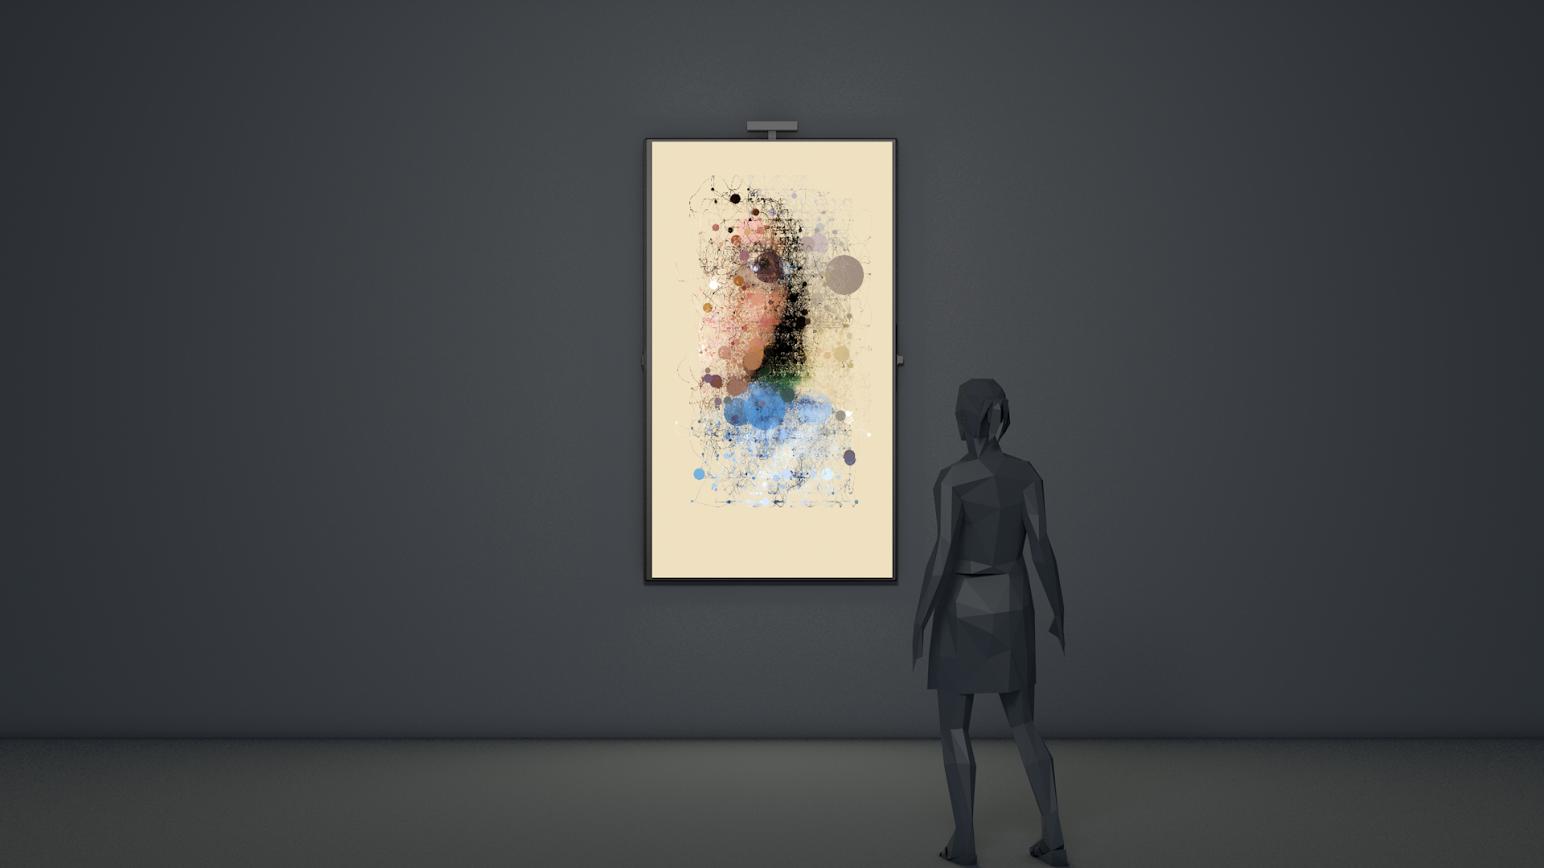 Random Walker - Dripping  , interactive video installation, 38.7 x 22.3 x 2.3 in., 2016